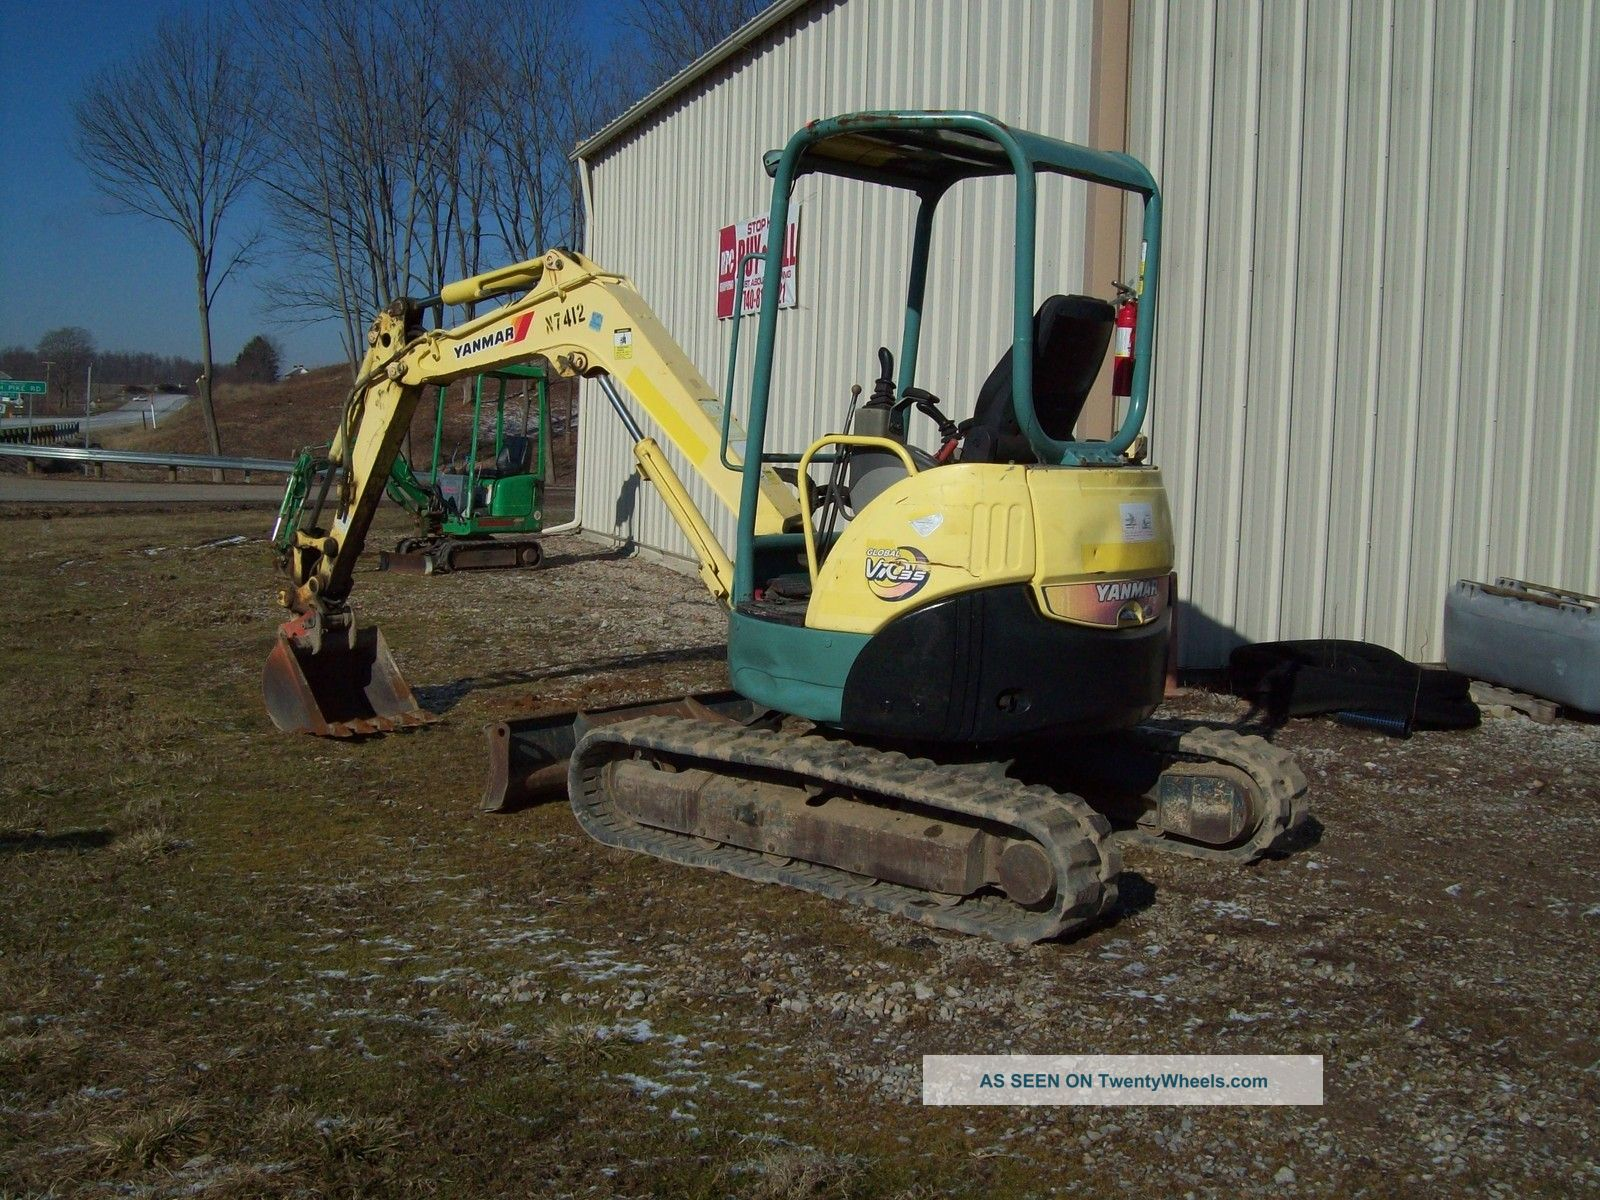 Yanmar 2500 Parts : Yanmar vio mini excavator hours